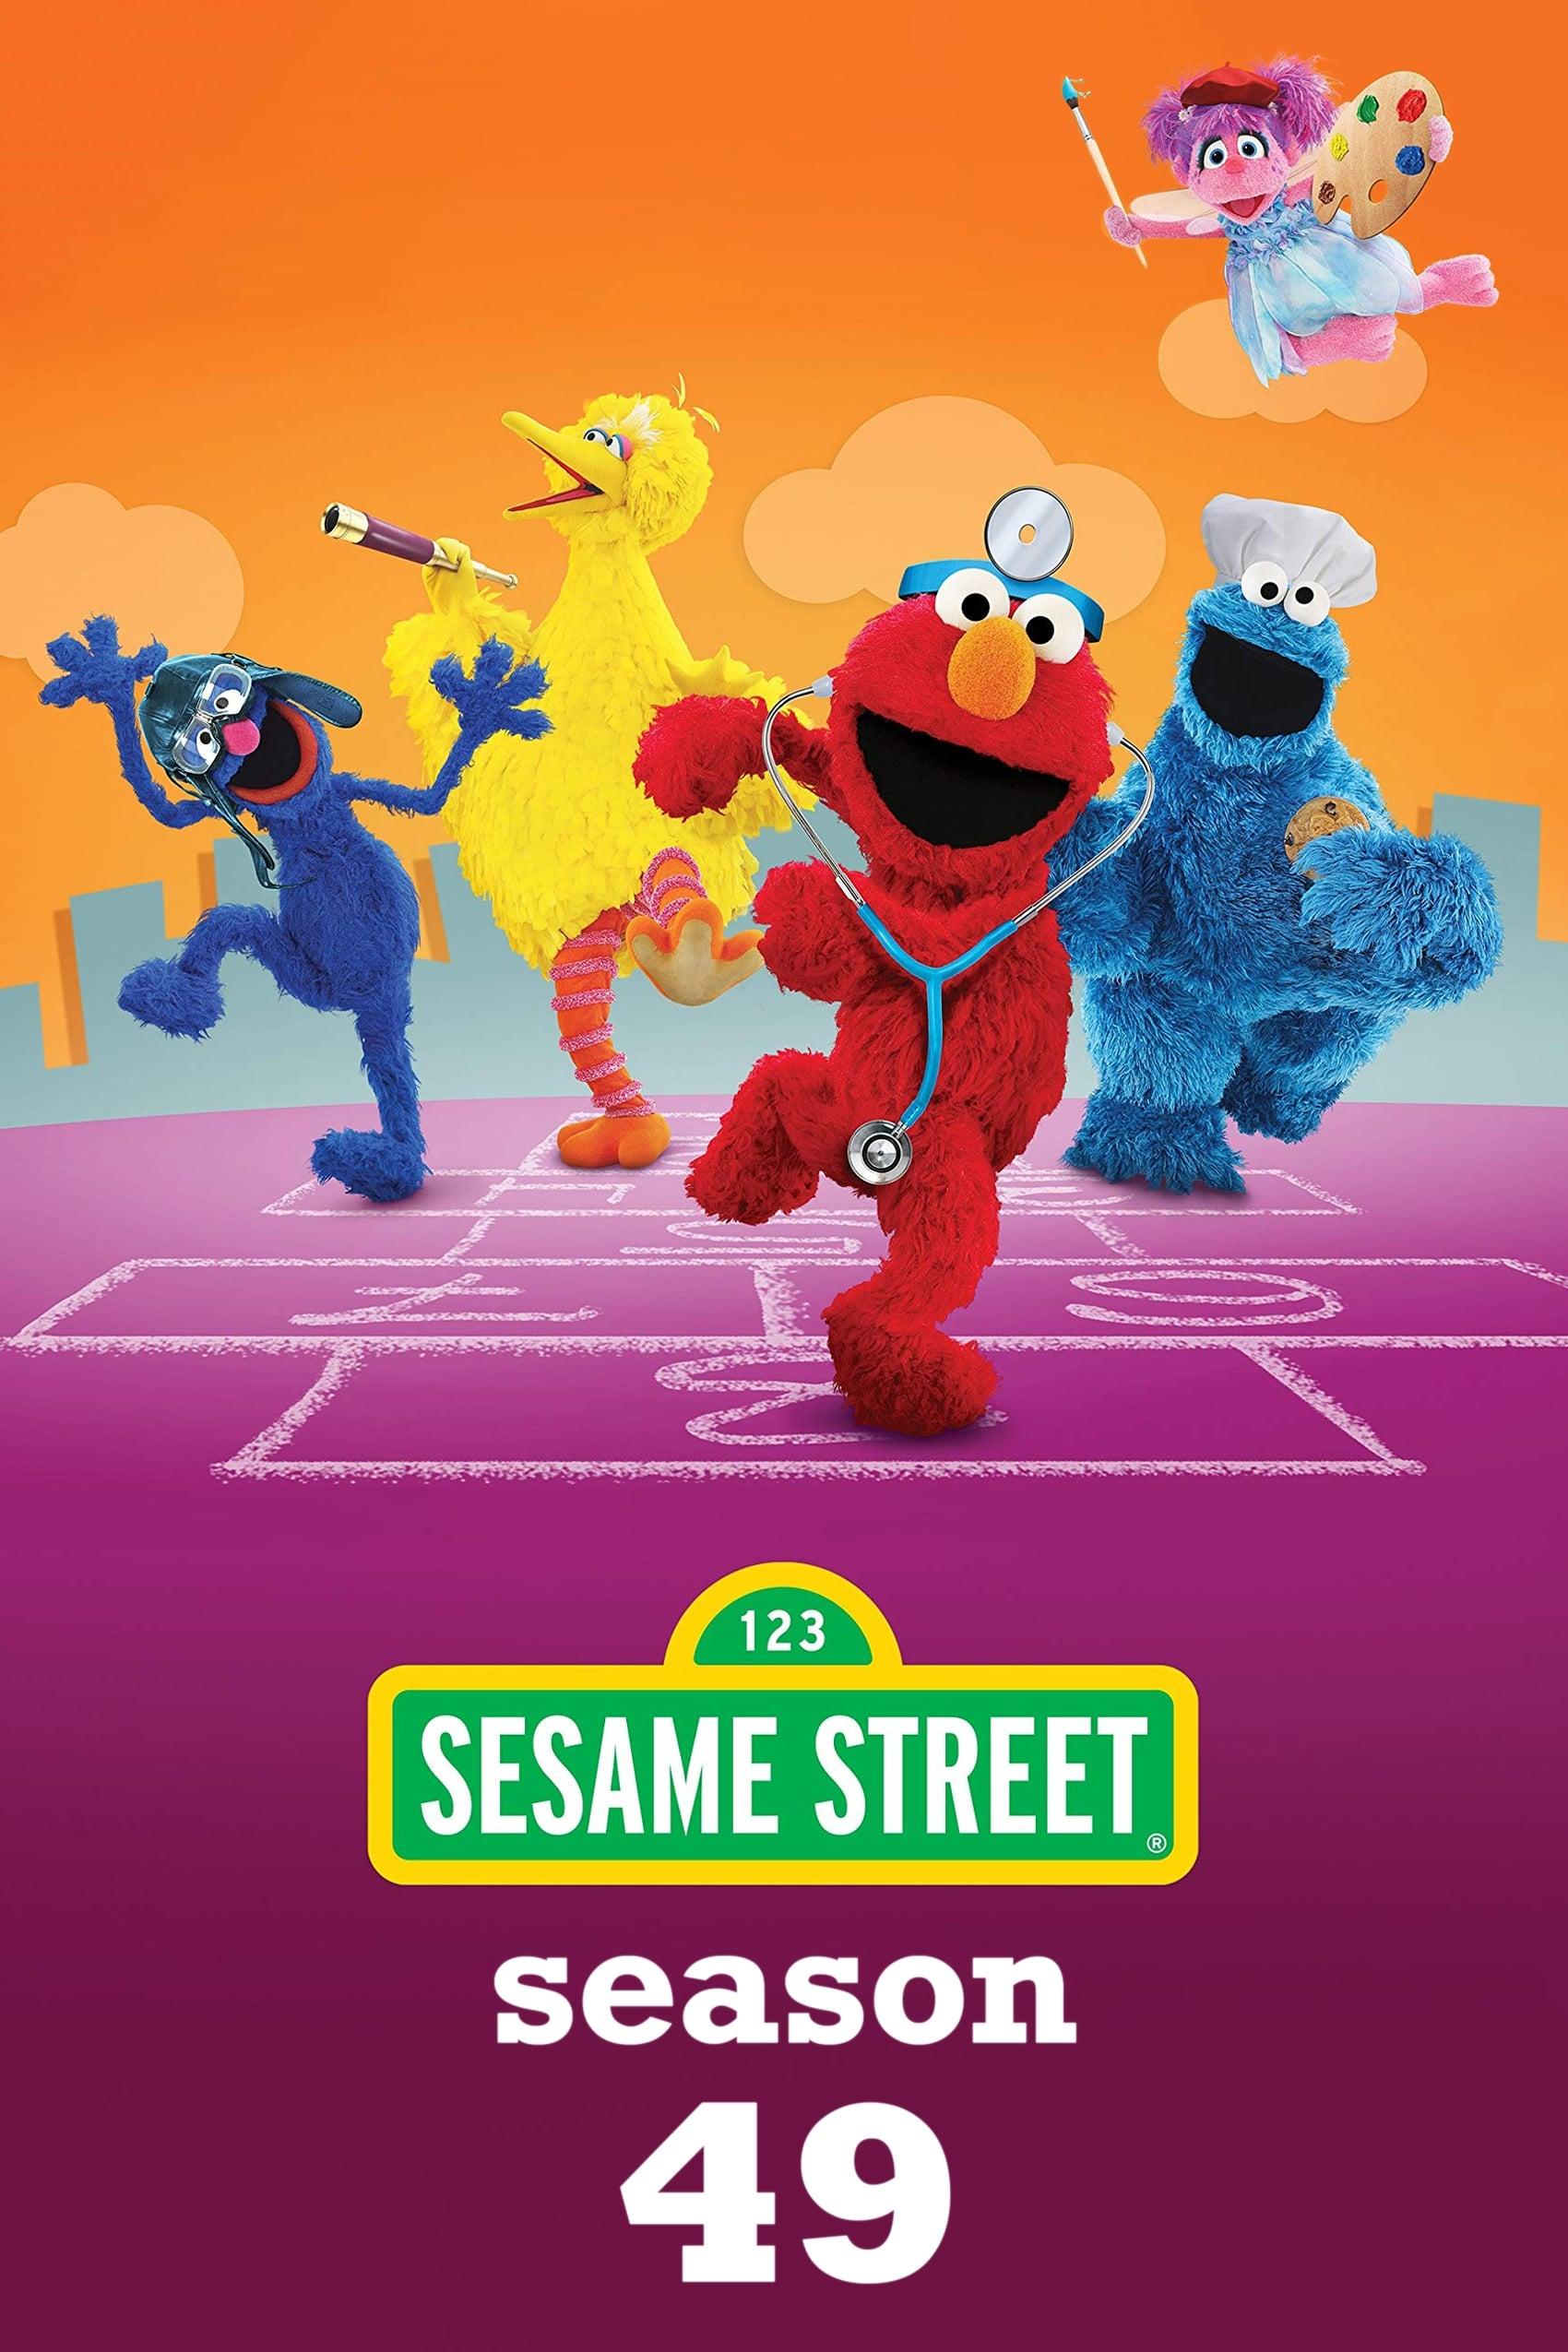 Sesame Street Season 49